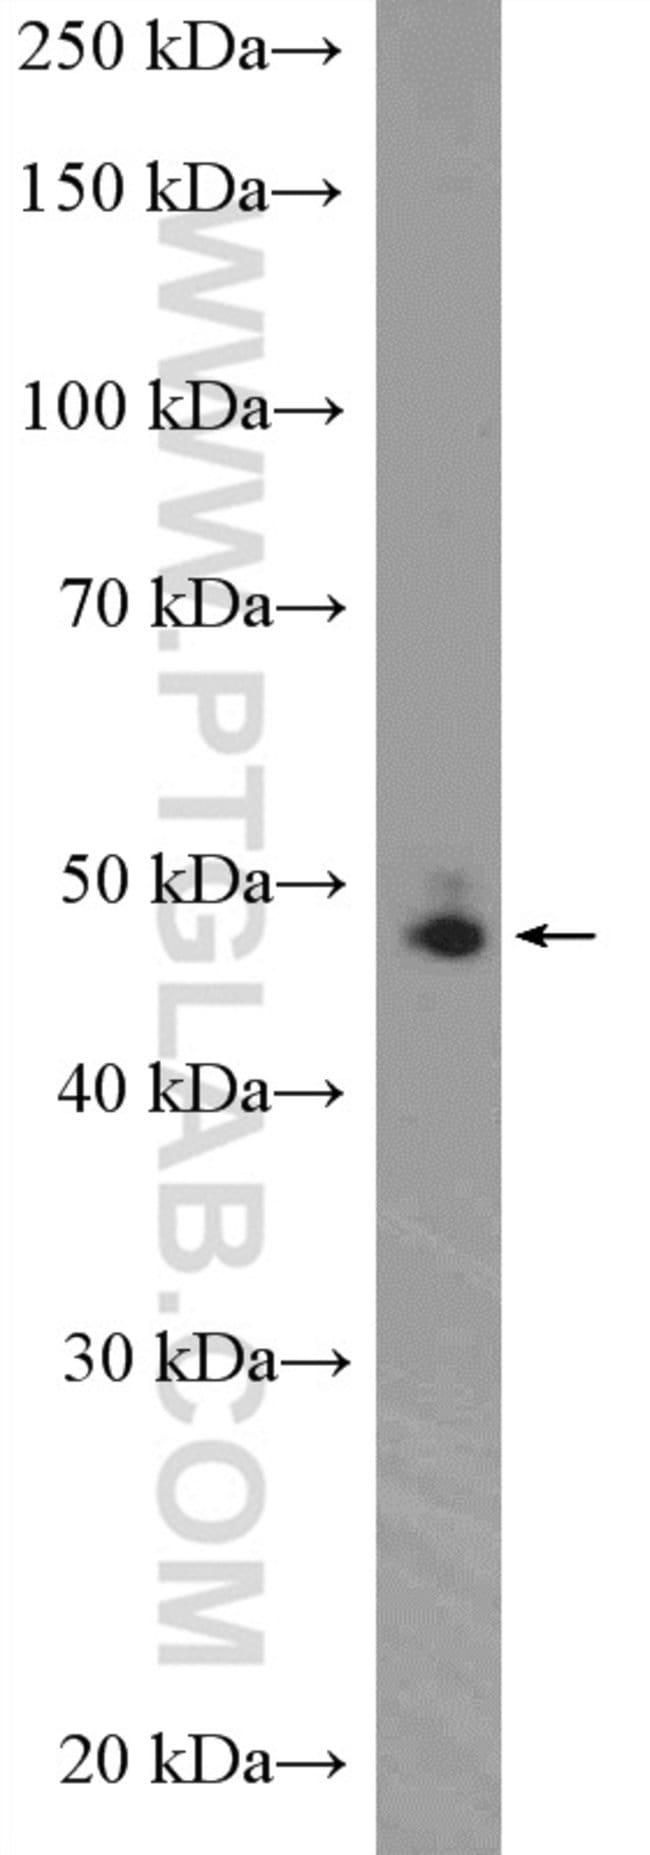 DDX39B Rabbit anti-Human, Mouse, Rat, Polyclonal, Proteintech 150 μL; Unconjugated Ver productos